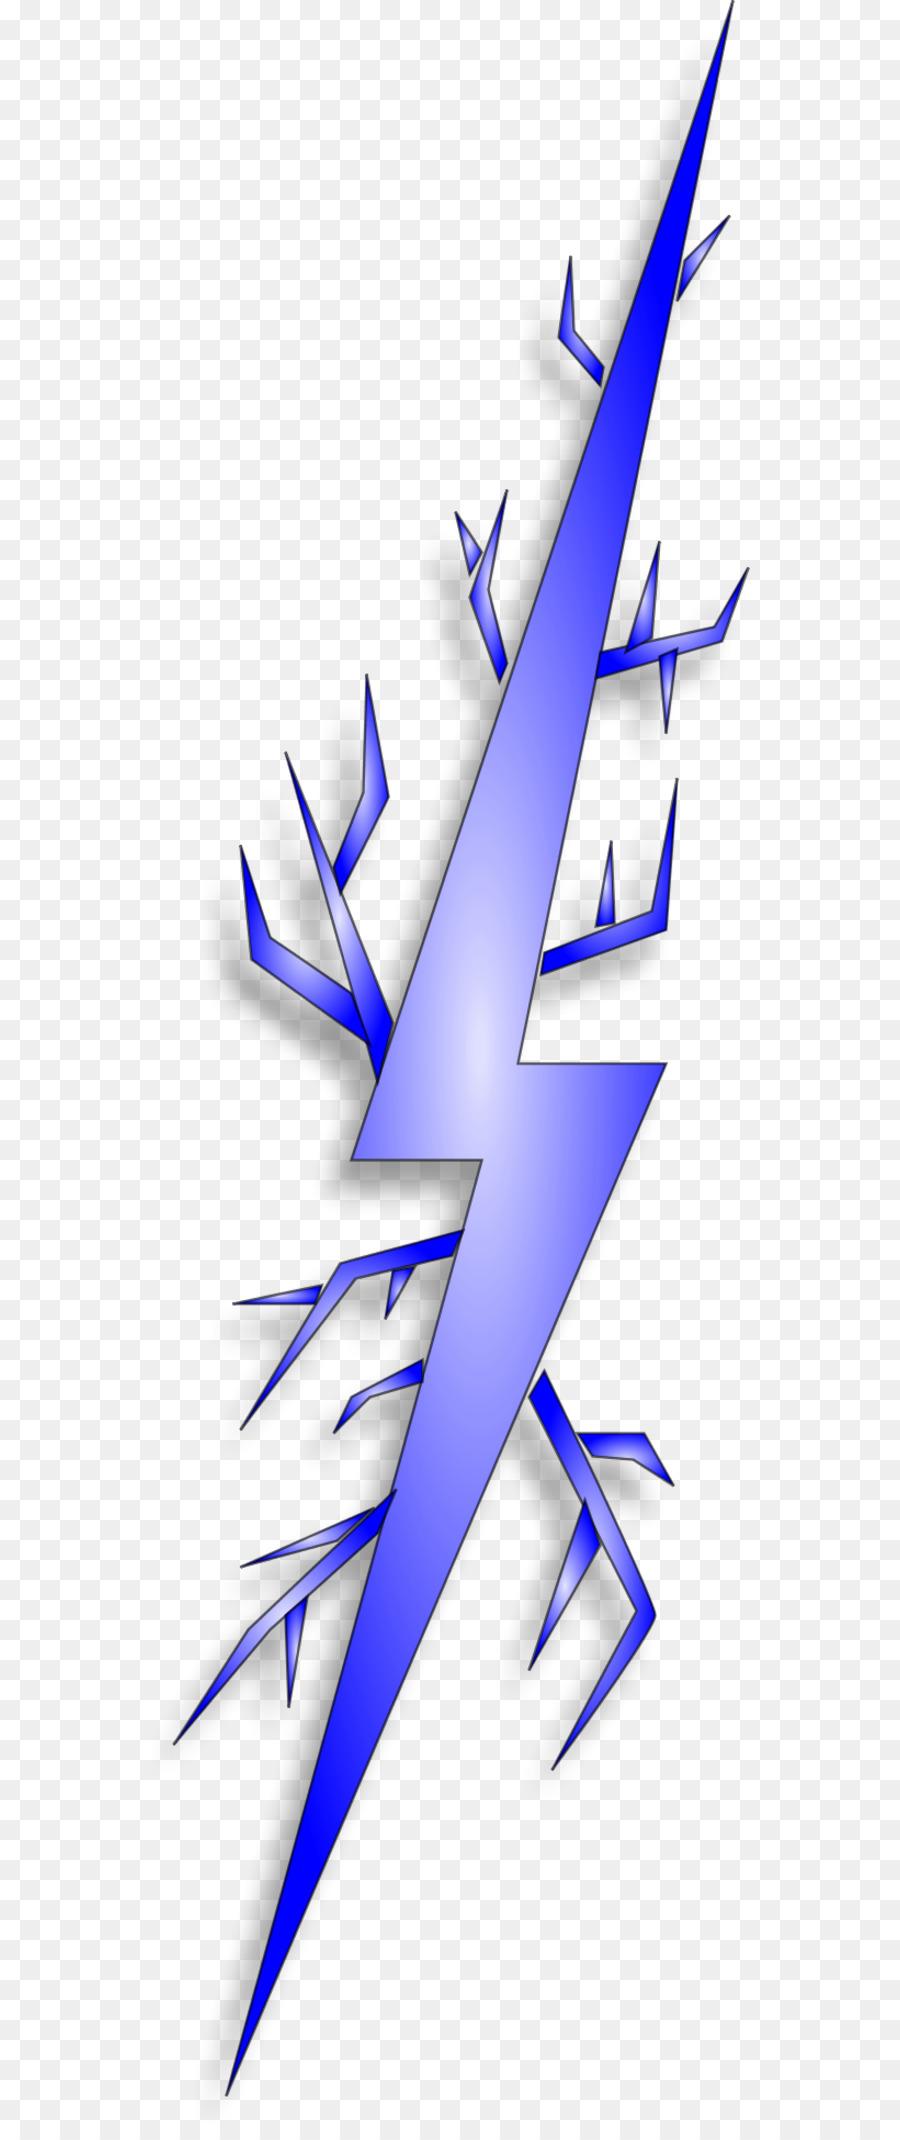 percikan listrik scalable vector graphics spark gambar png percikan listrik scalable vector